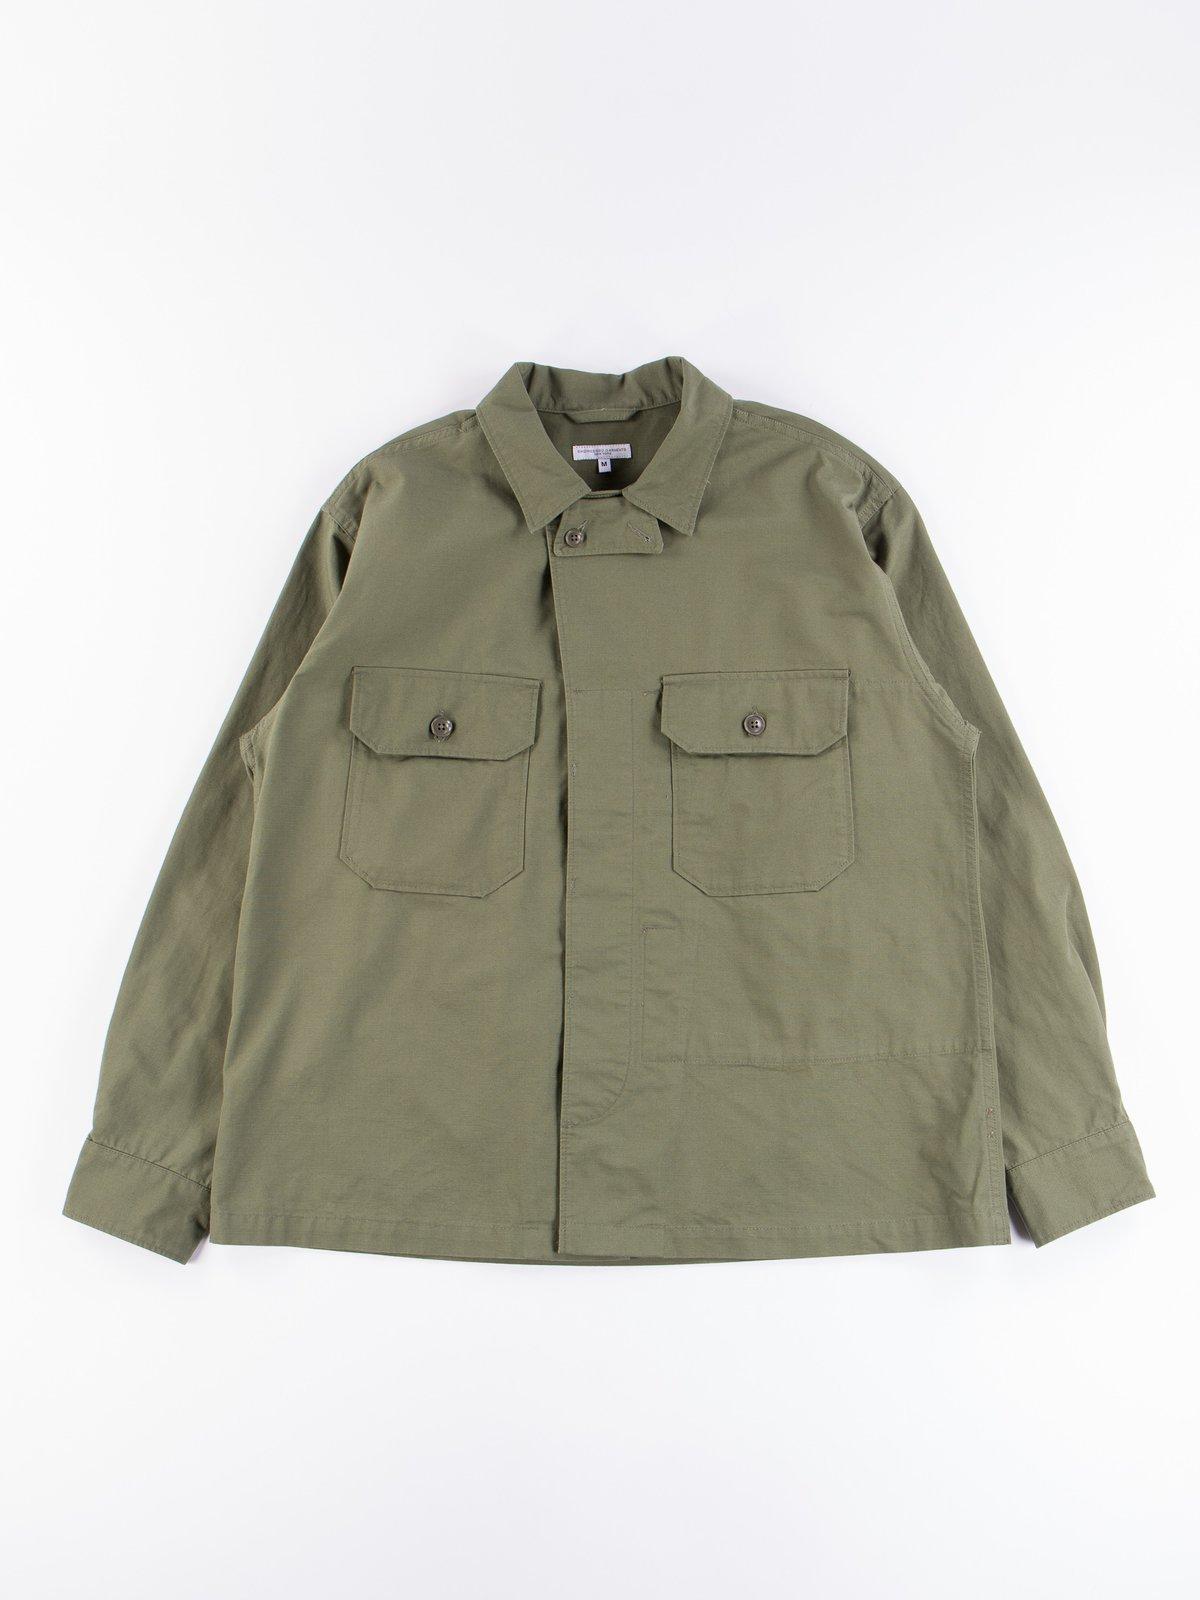 Olive Cotton Ripstop MC Shirt Jacket - Image 1